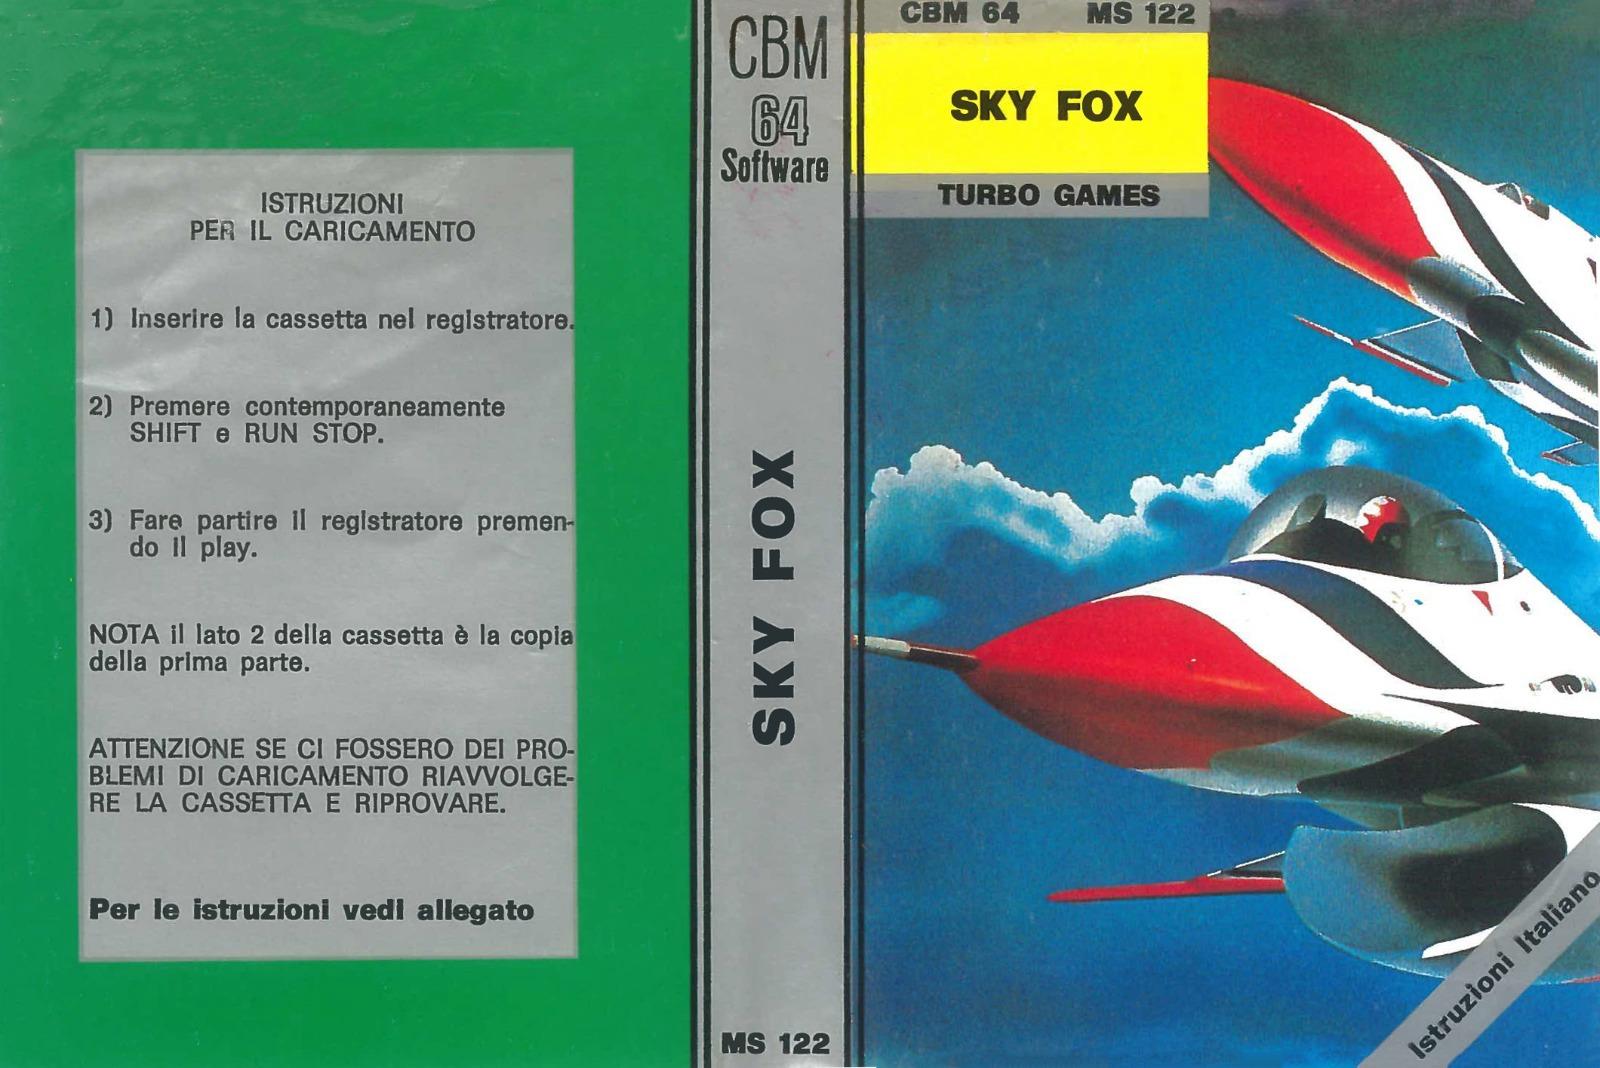 SKY FOX MS 122